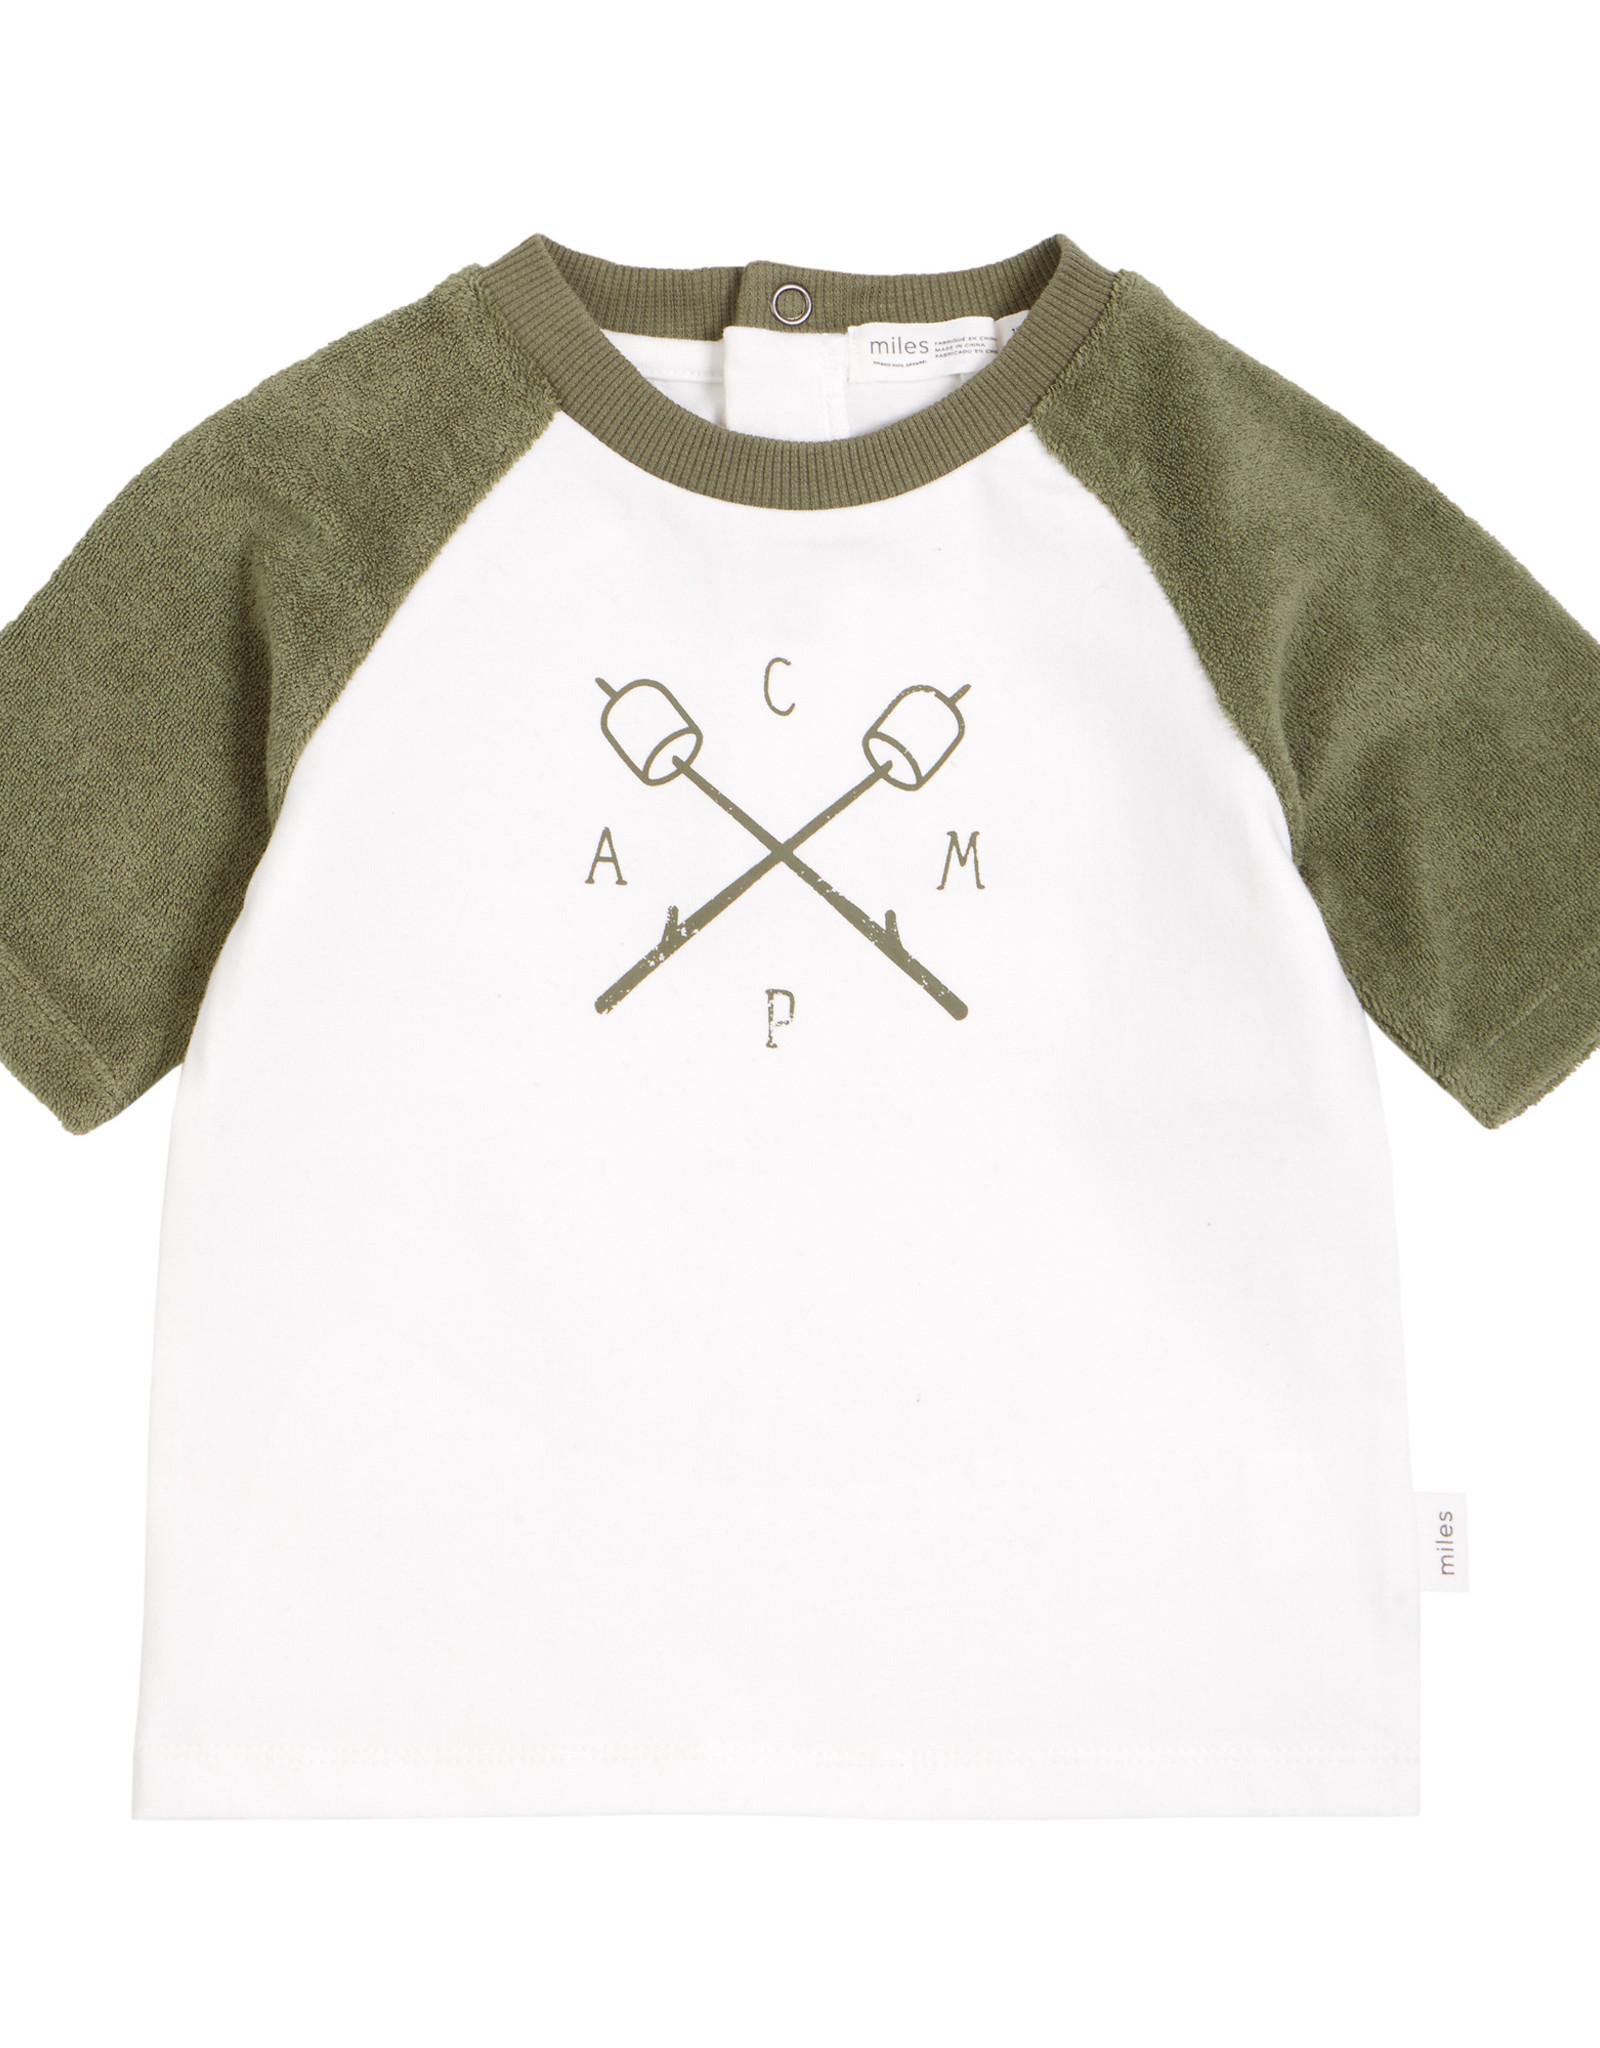 Miles Baby Camp Baby T-shirt